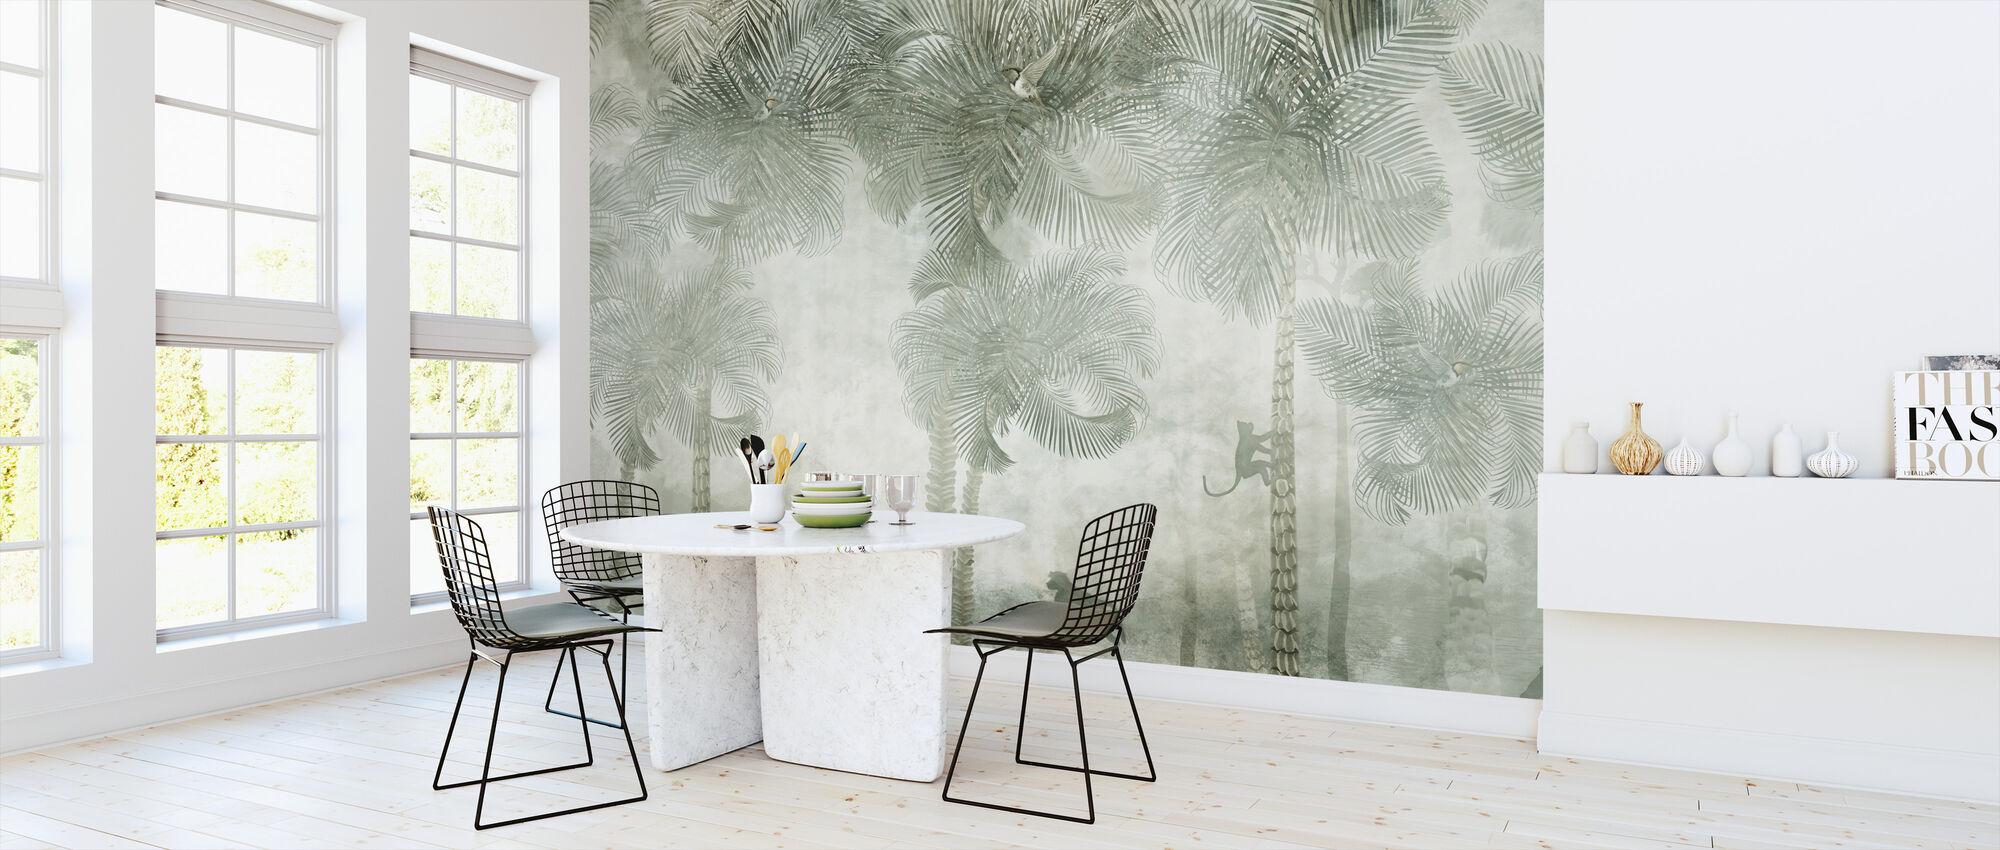 Monkeys Residence V - Wallpaper - Kitchen